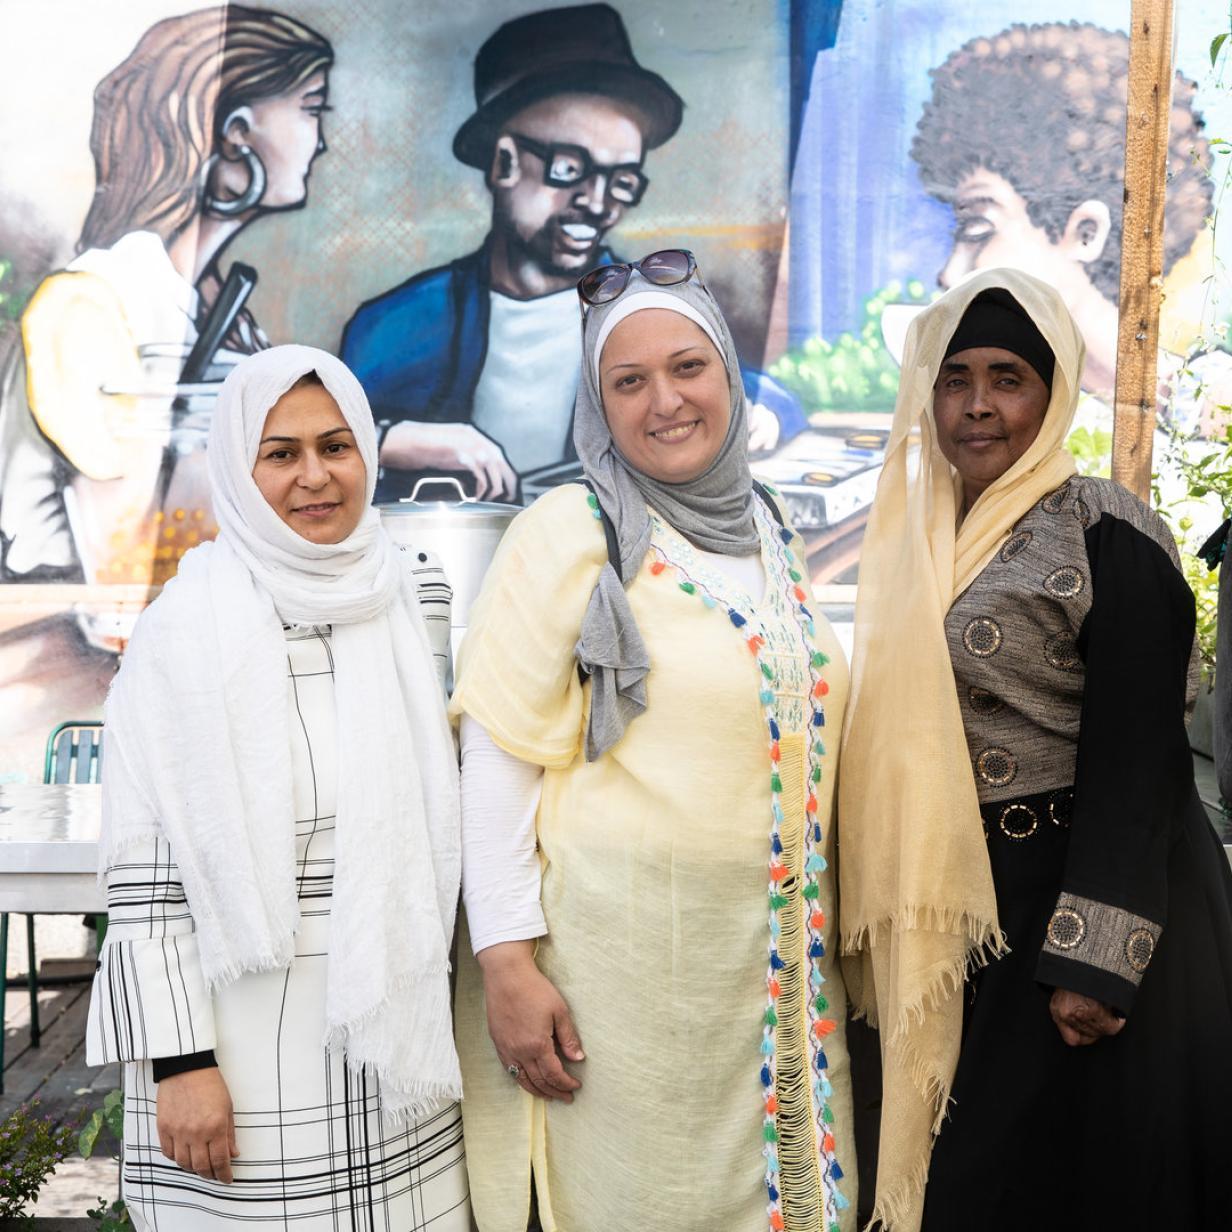 Flüchtlinge kochen: Wo man bei Fattoush ins Gespräch kommt